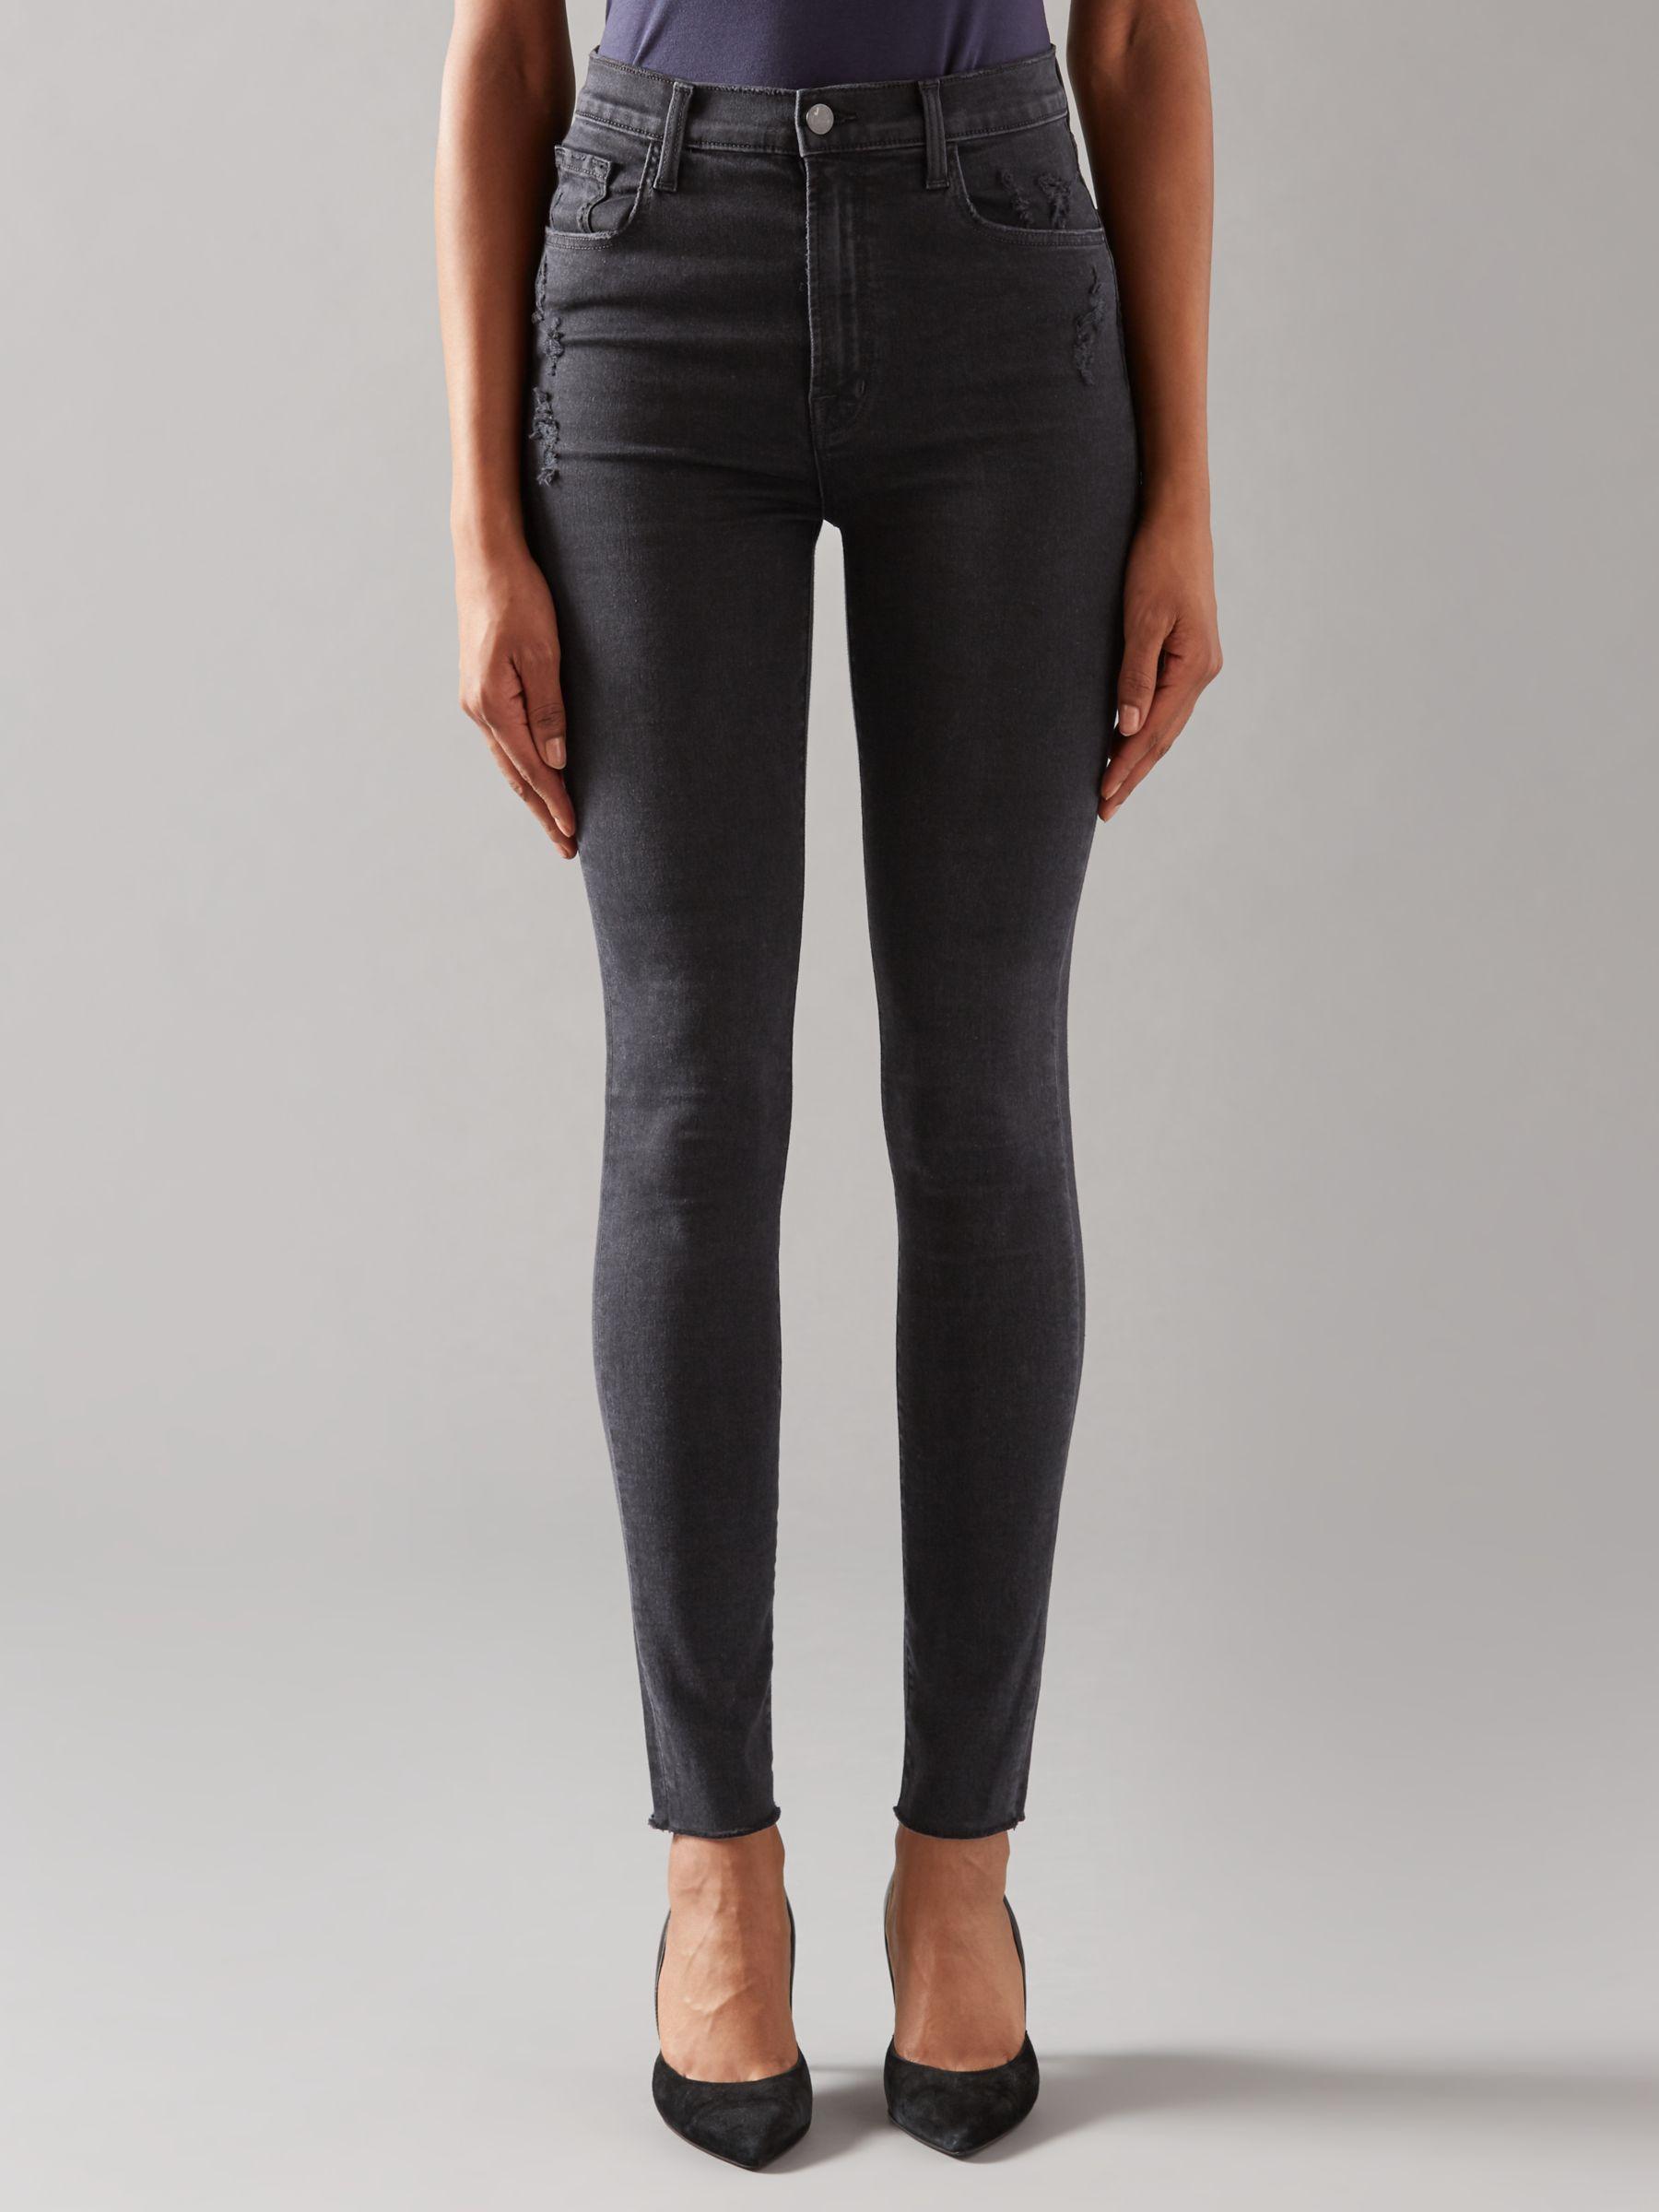 J Brand J Brand Carolina High Rise Skinny Jeans, Exile